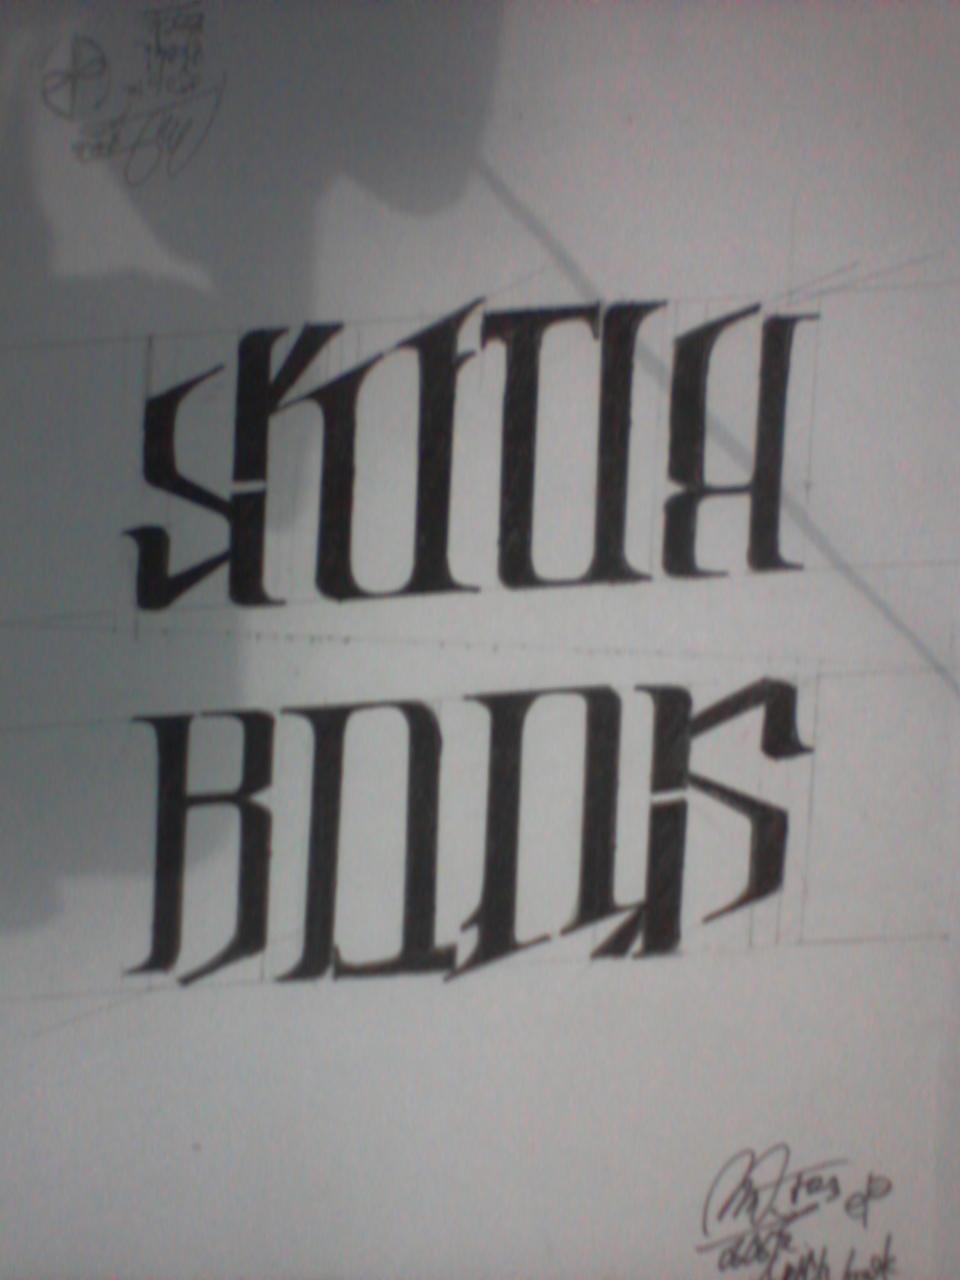 Ambigram Tattoos Ideas & Designs